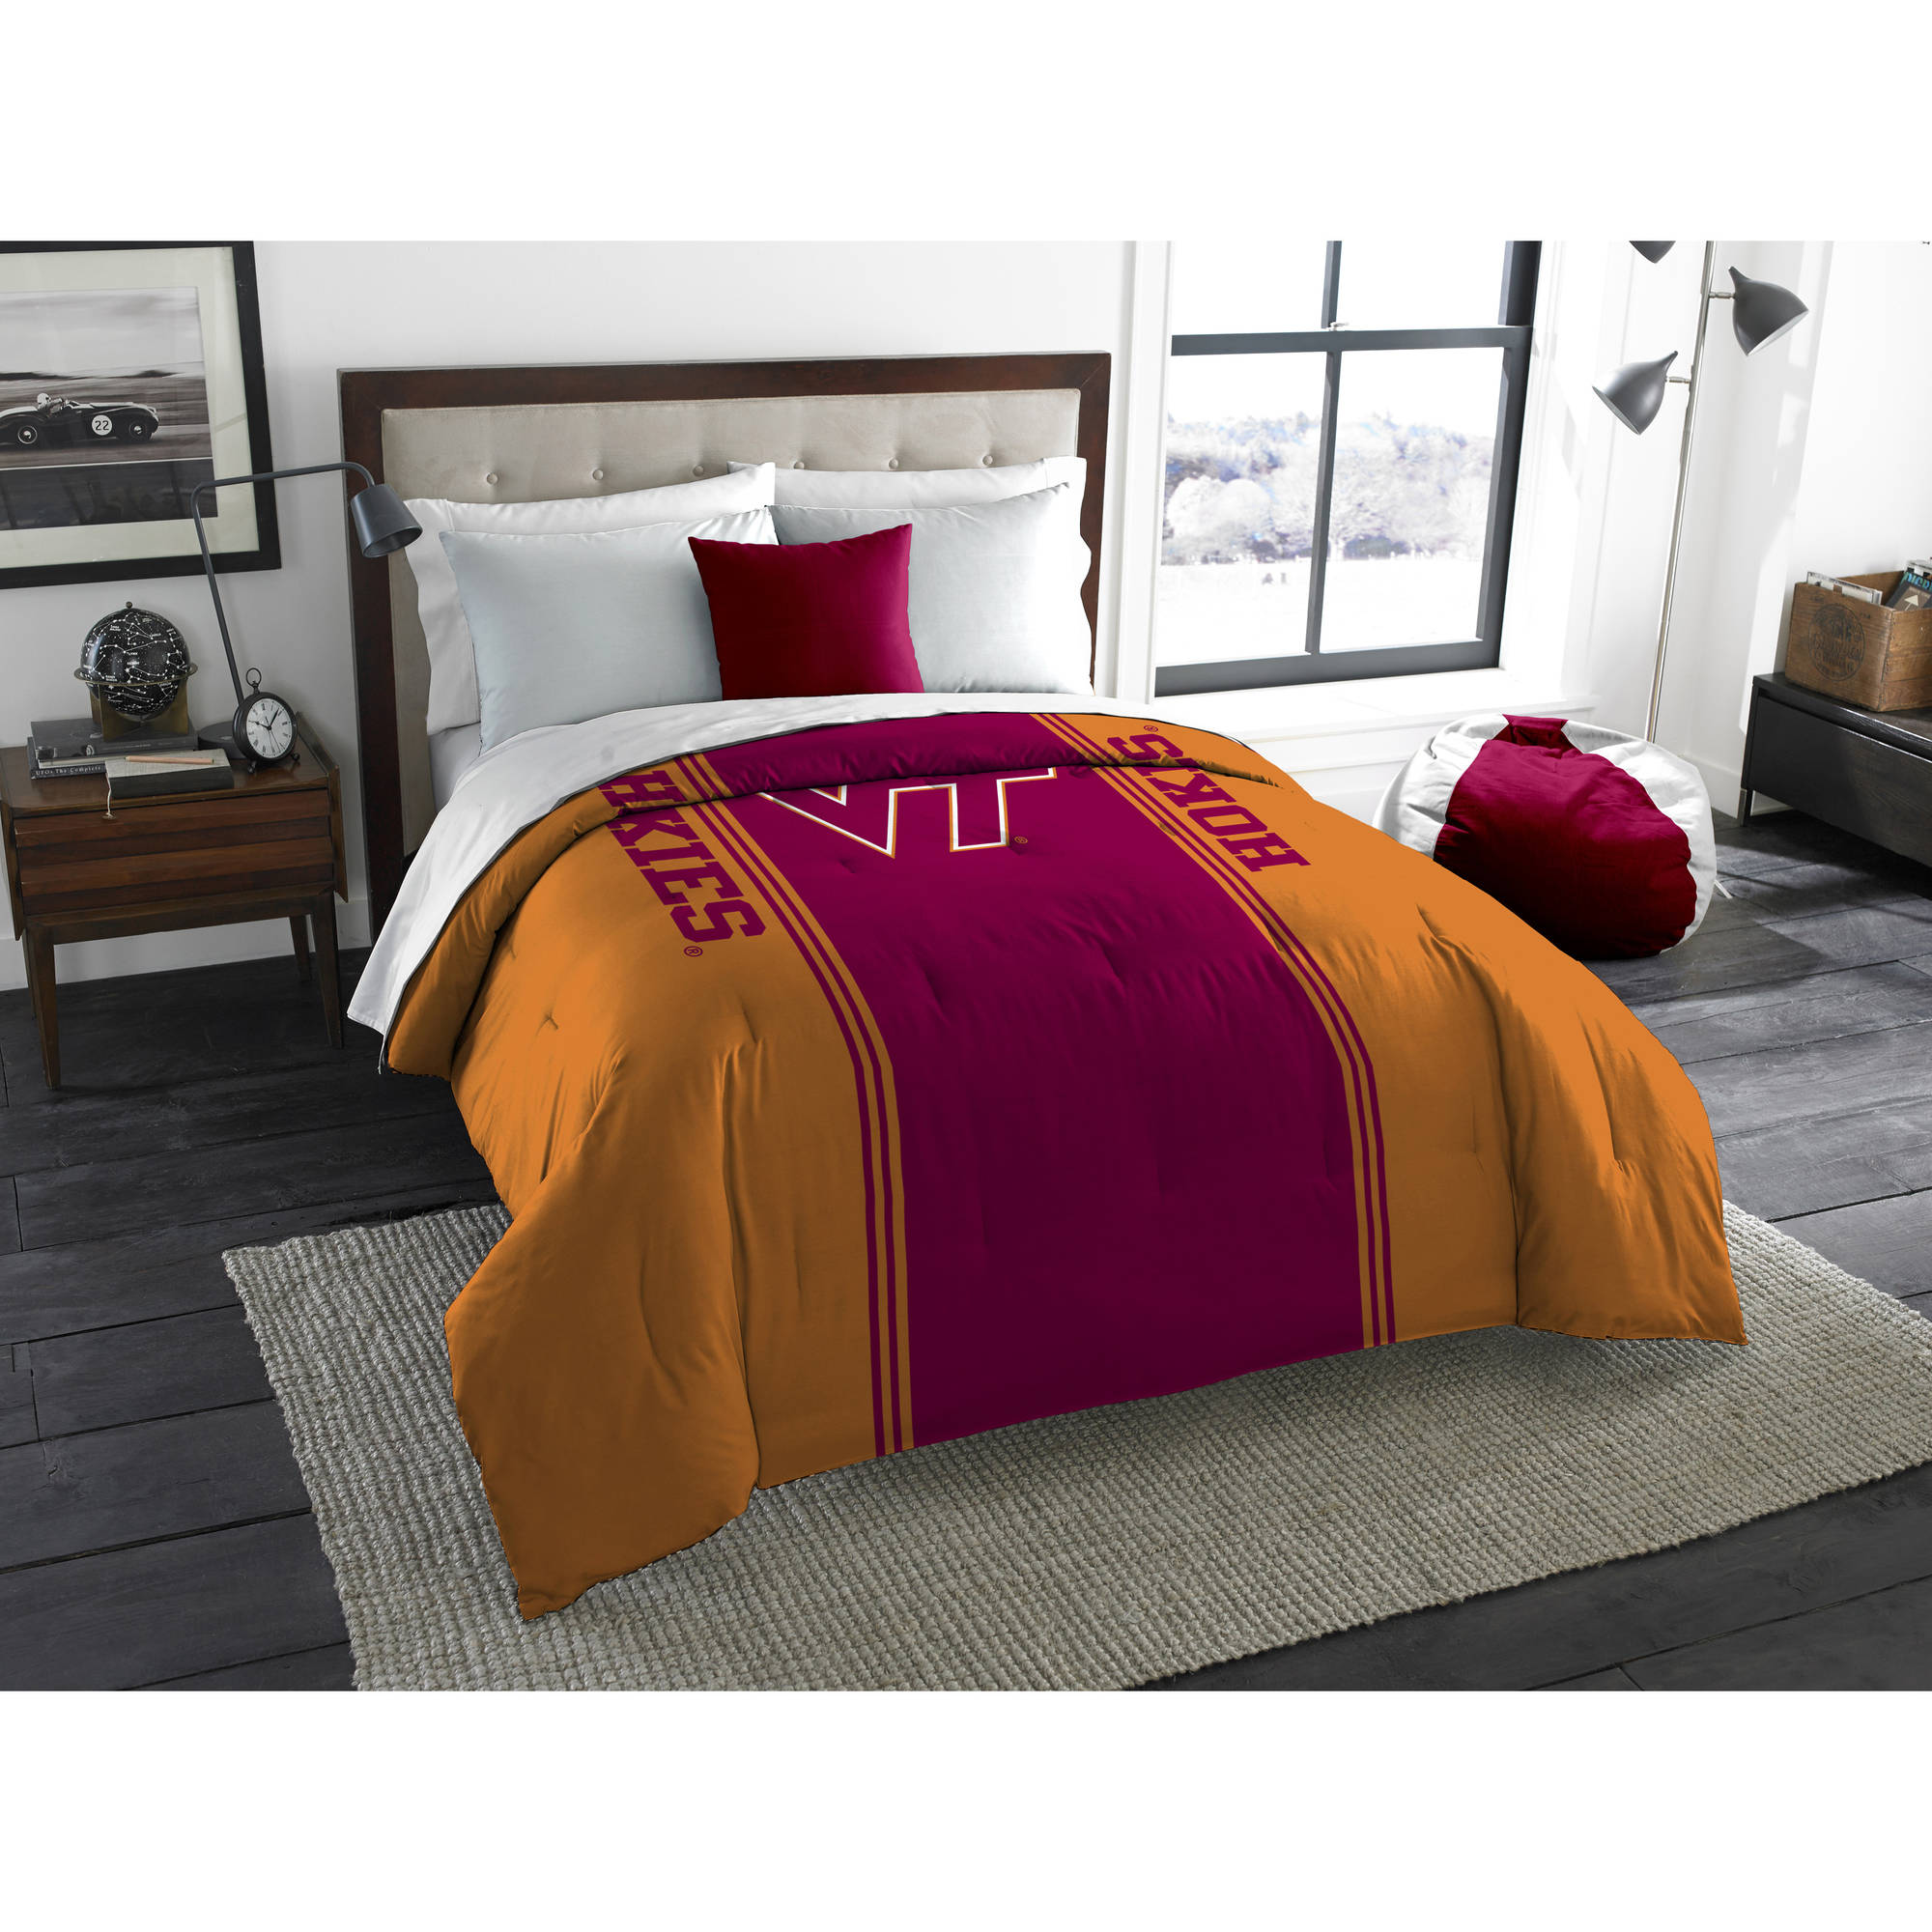 "NCAA Virginia Tech Hokies ""Mascot"" Twin/Full Bedding Comforter"